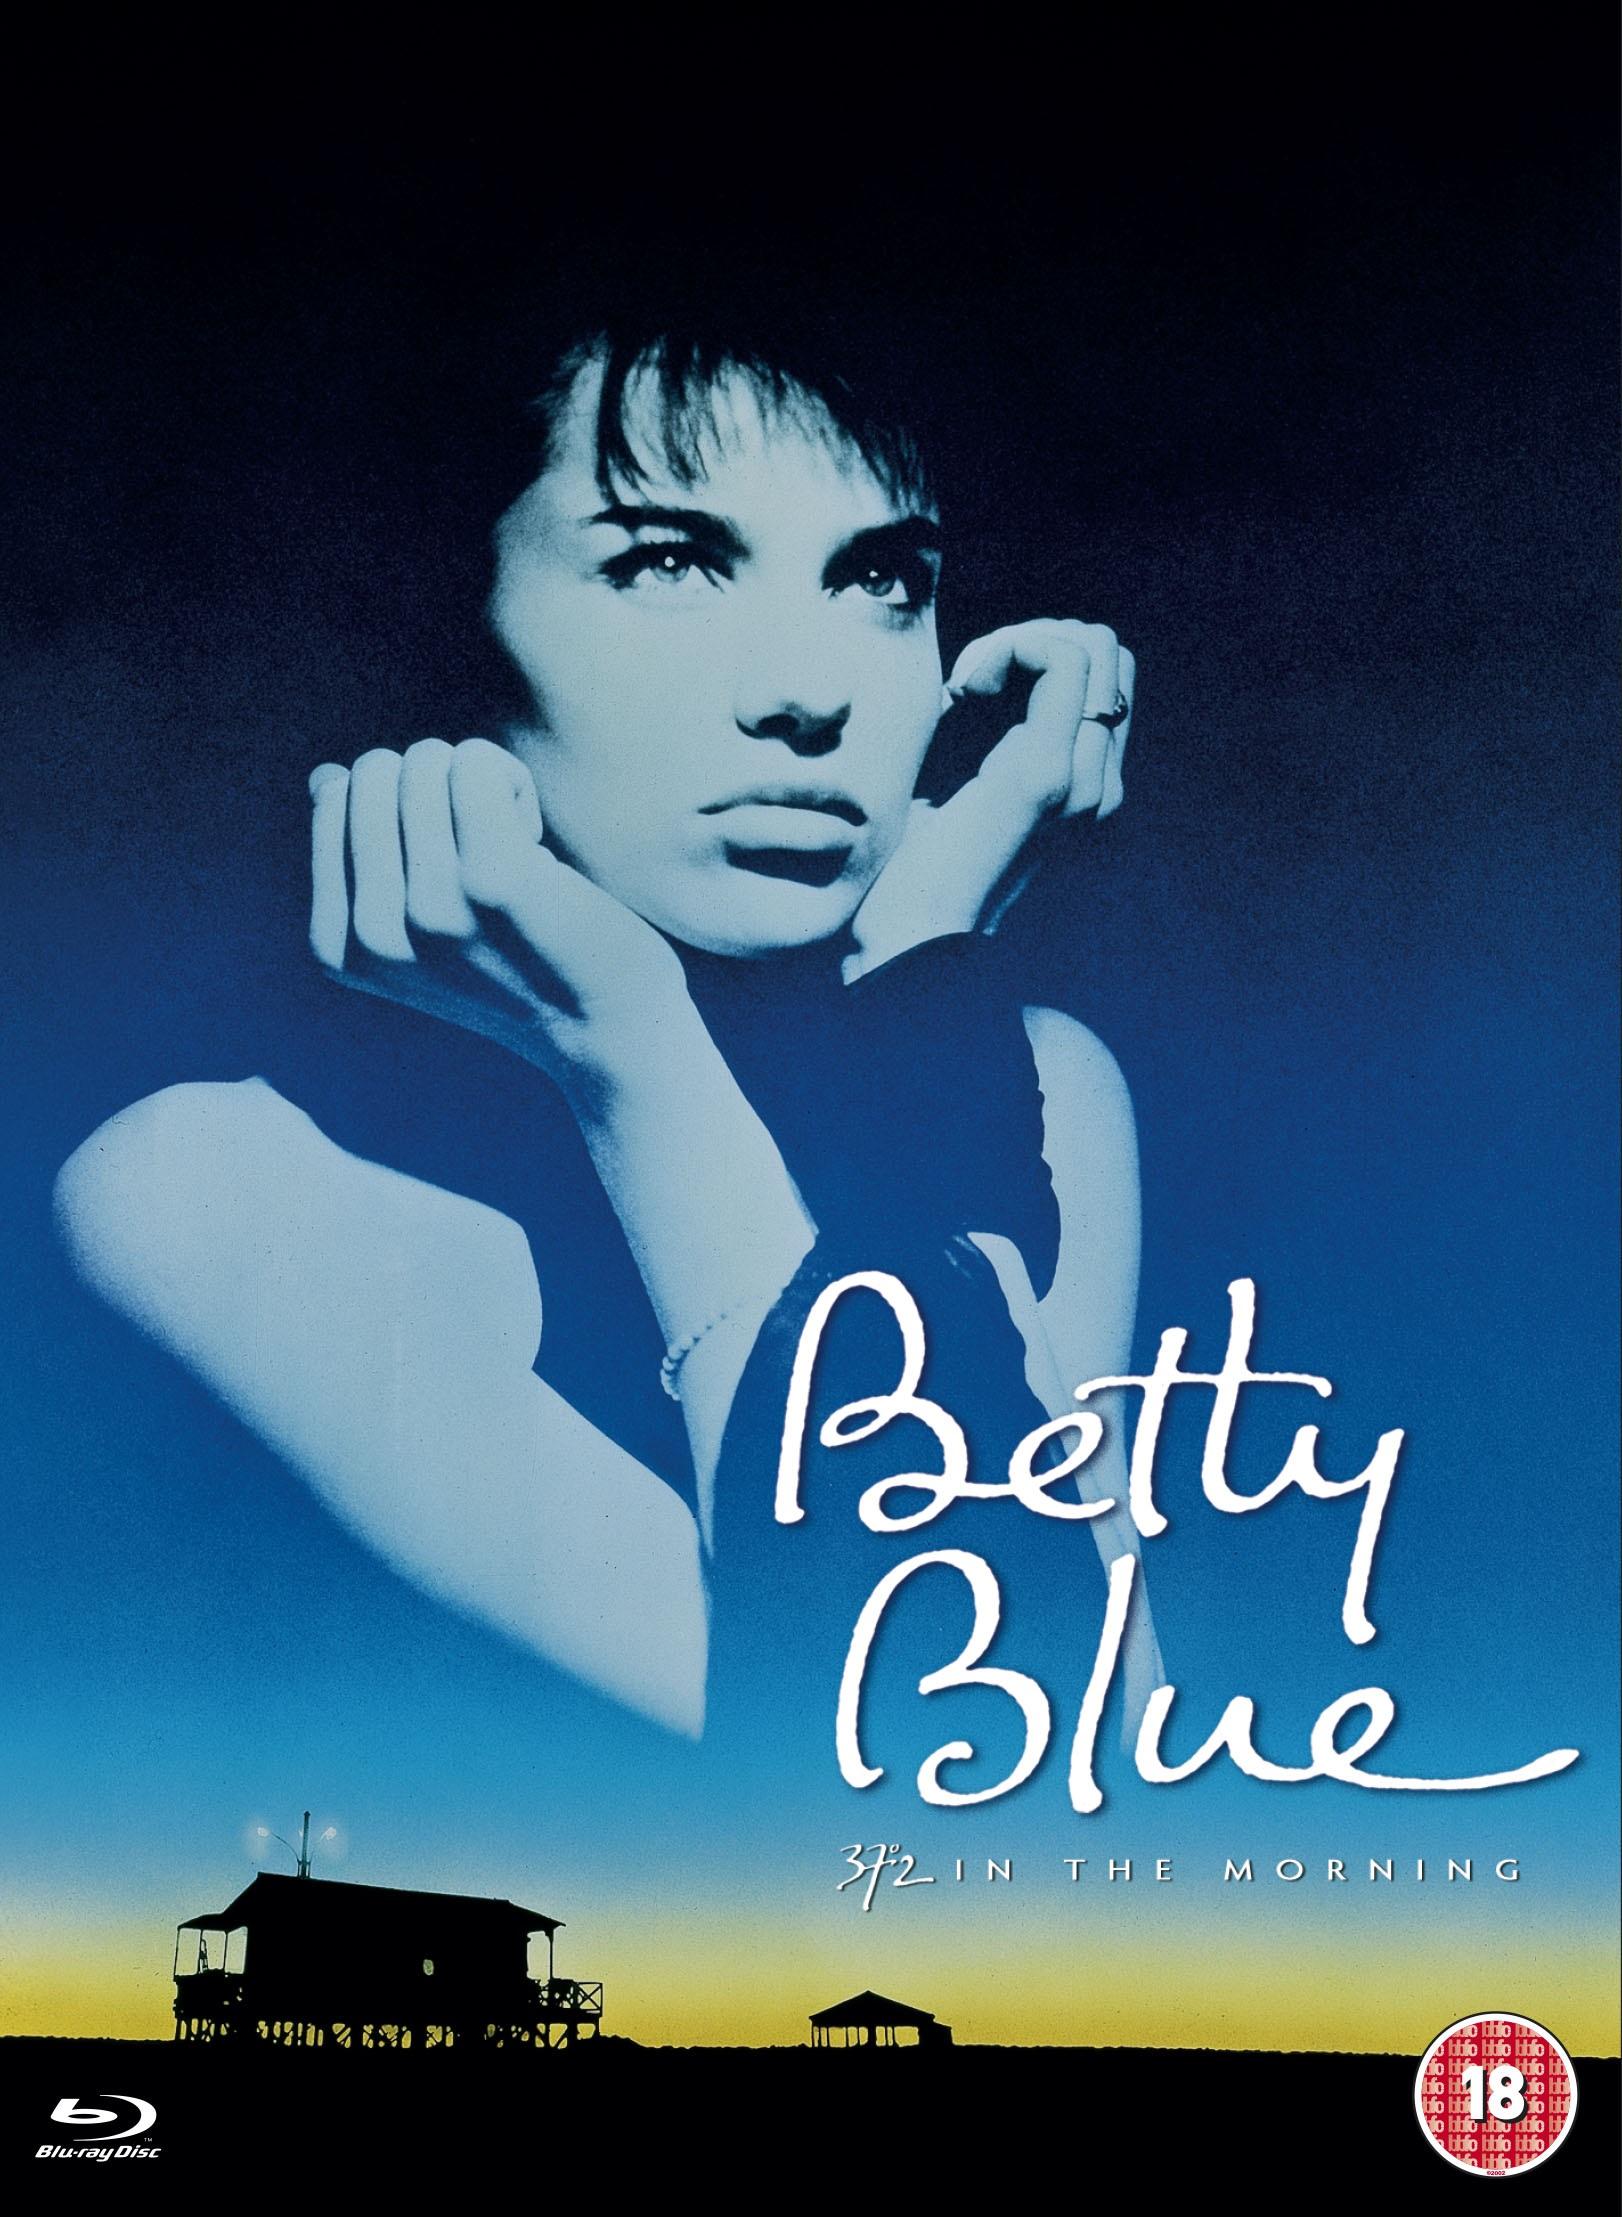 pol-betty-blue1